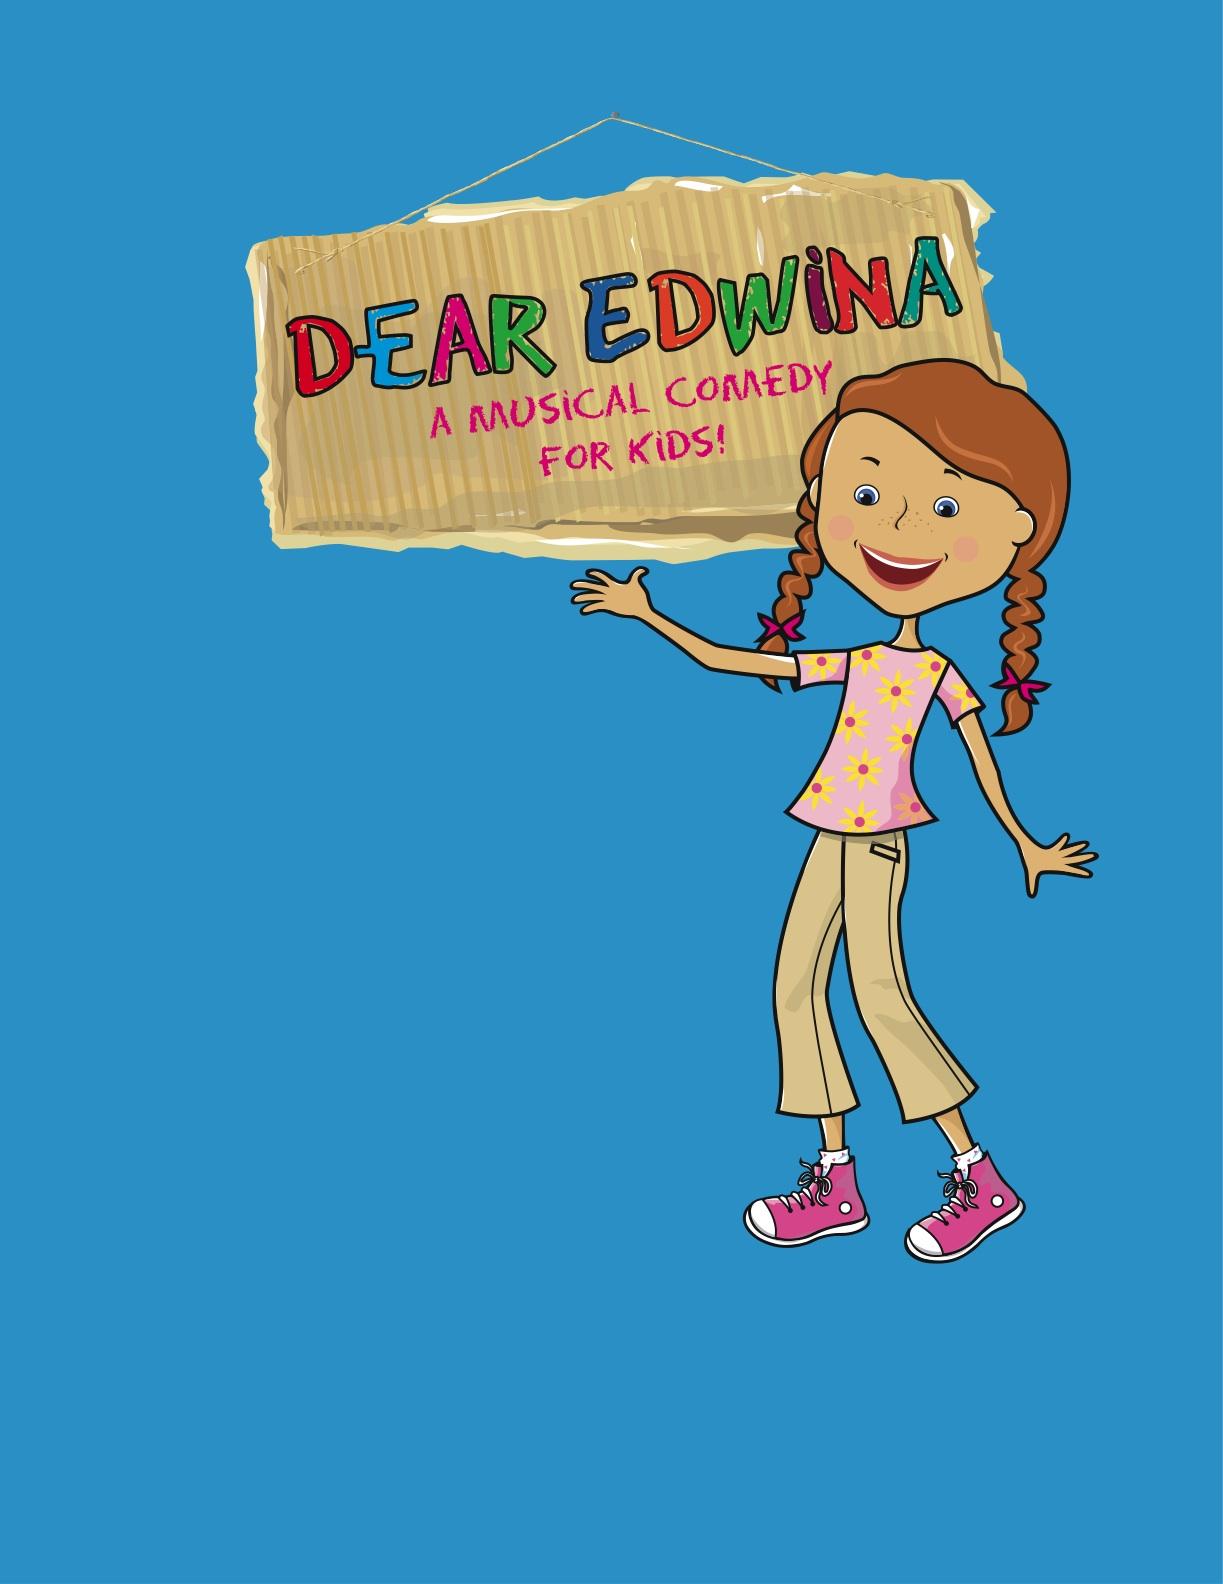 Casting Announced for Goldrich and Heisler's DEAR EDWINA